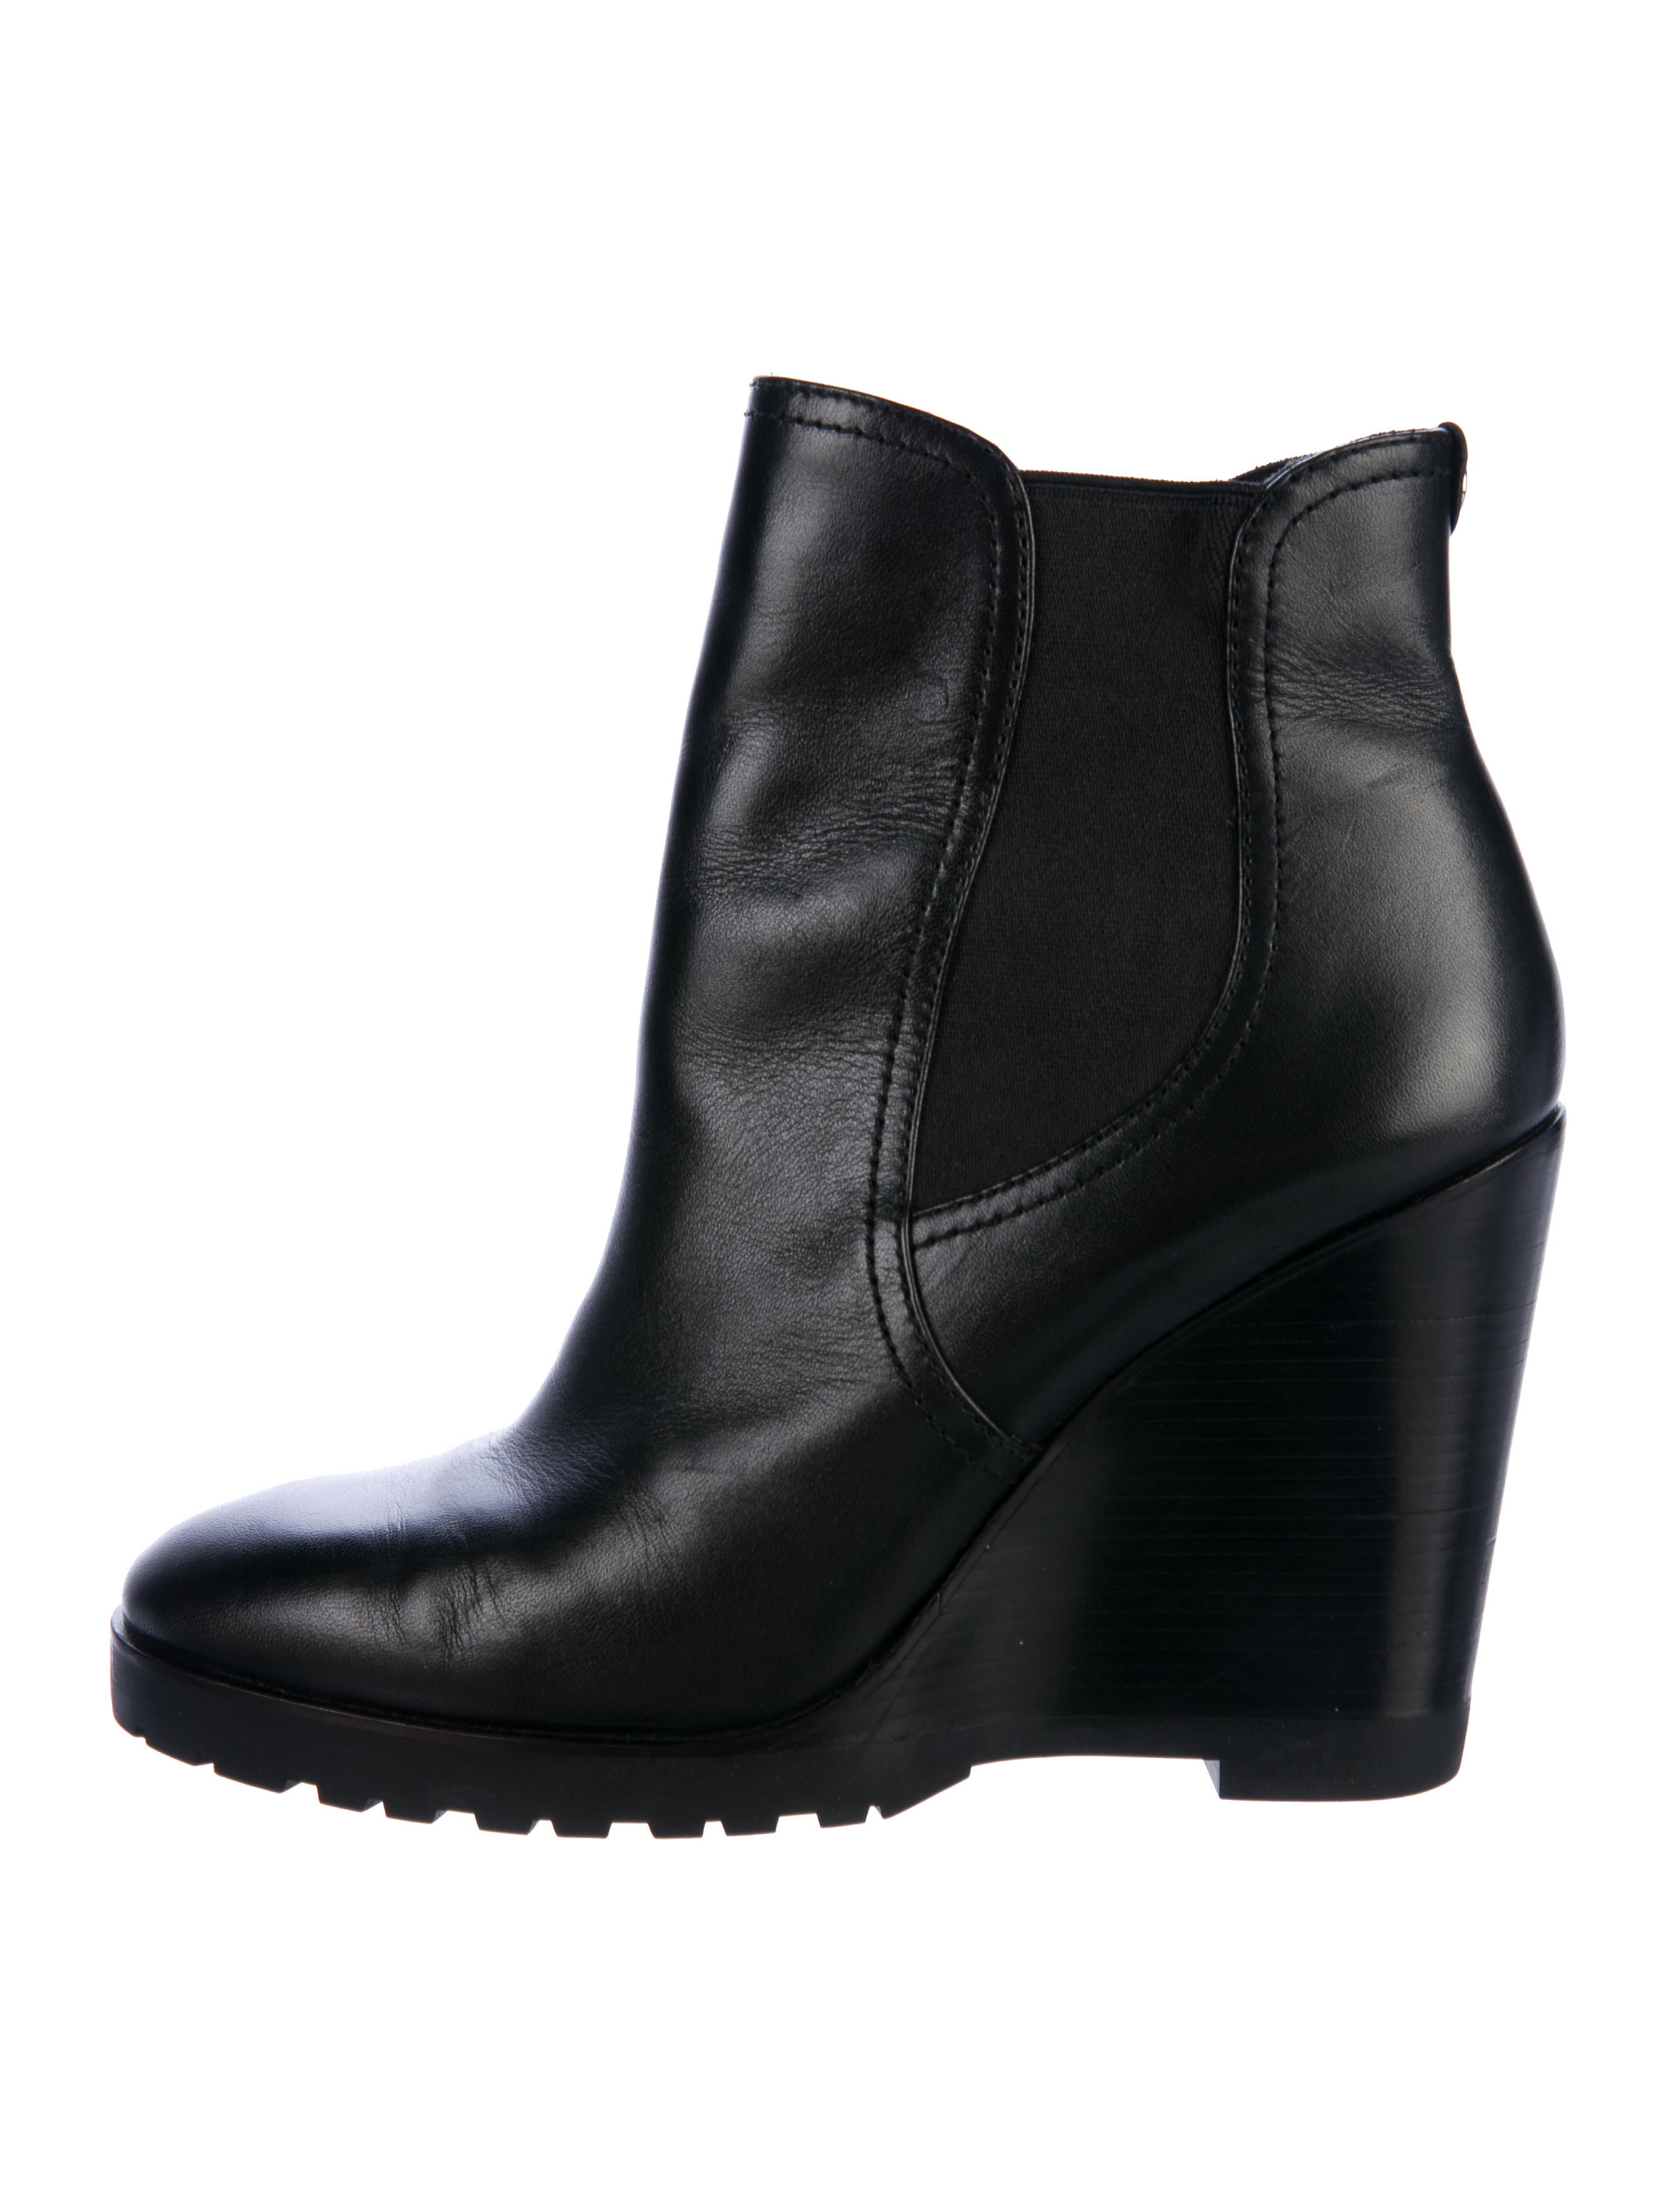 4bc75ac45e1 Michael Michael Kors Thea Wedge Boots - Shoes - WM523588